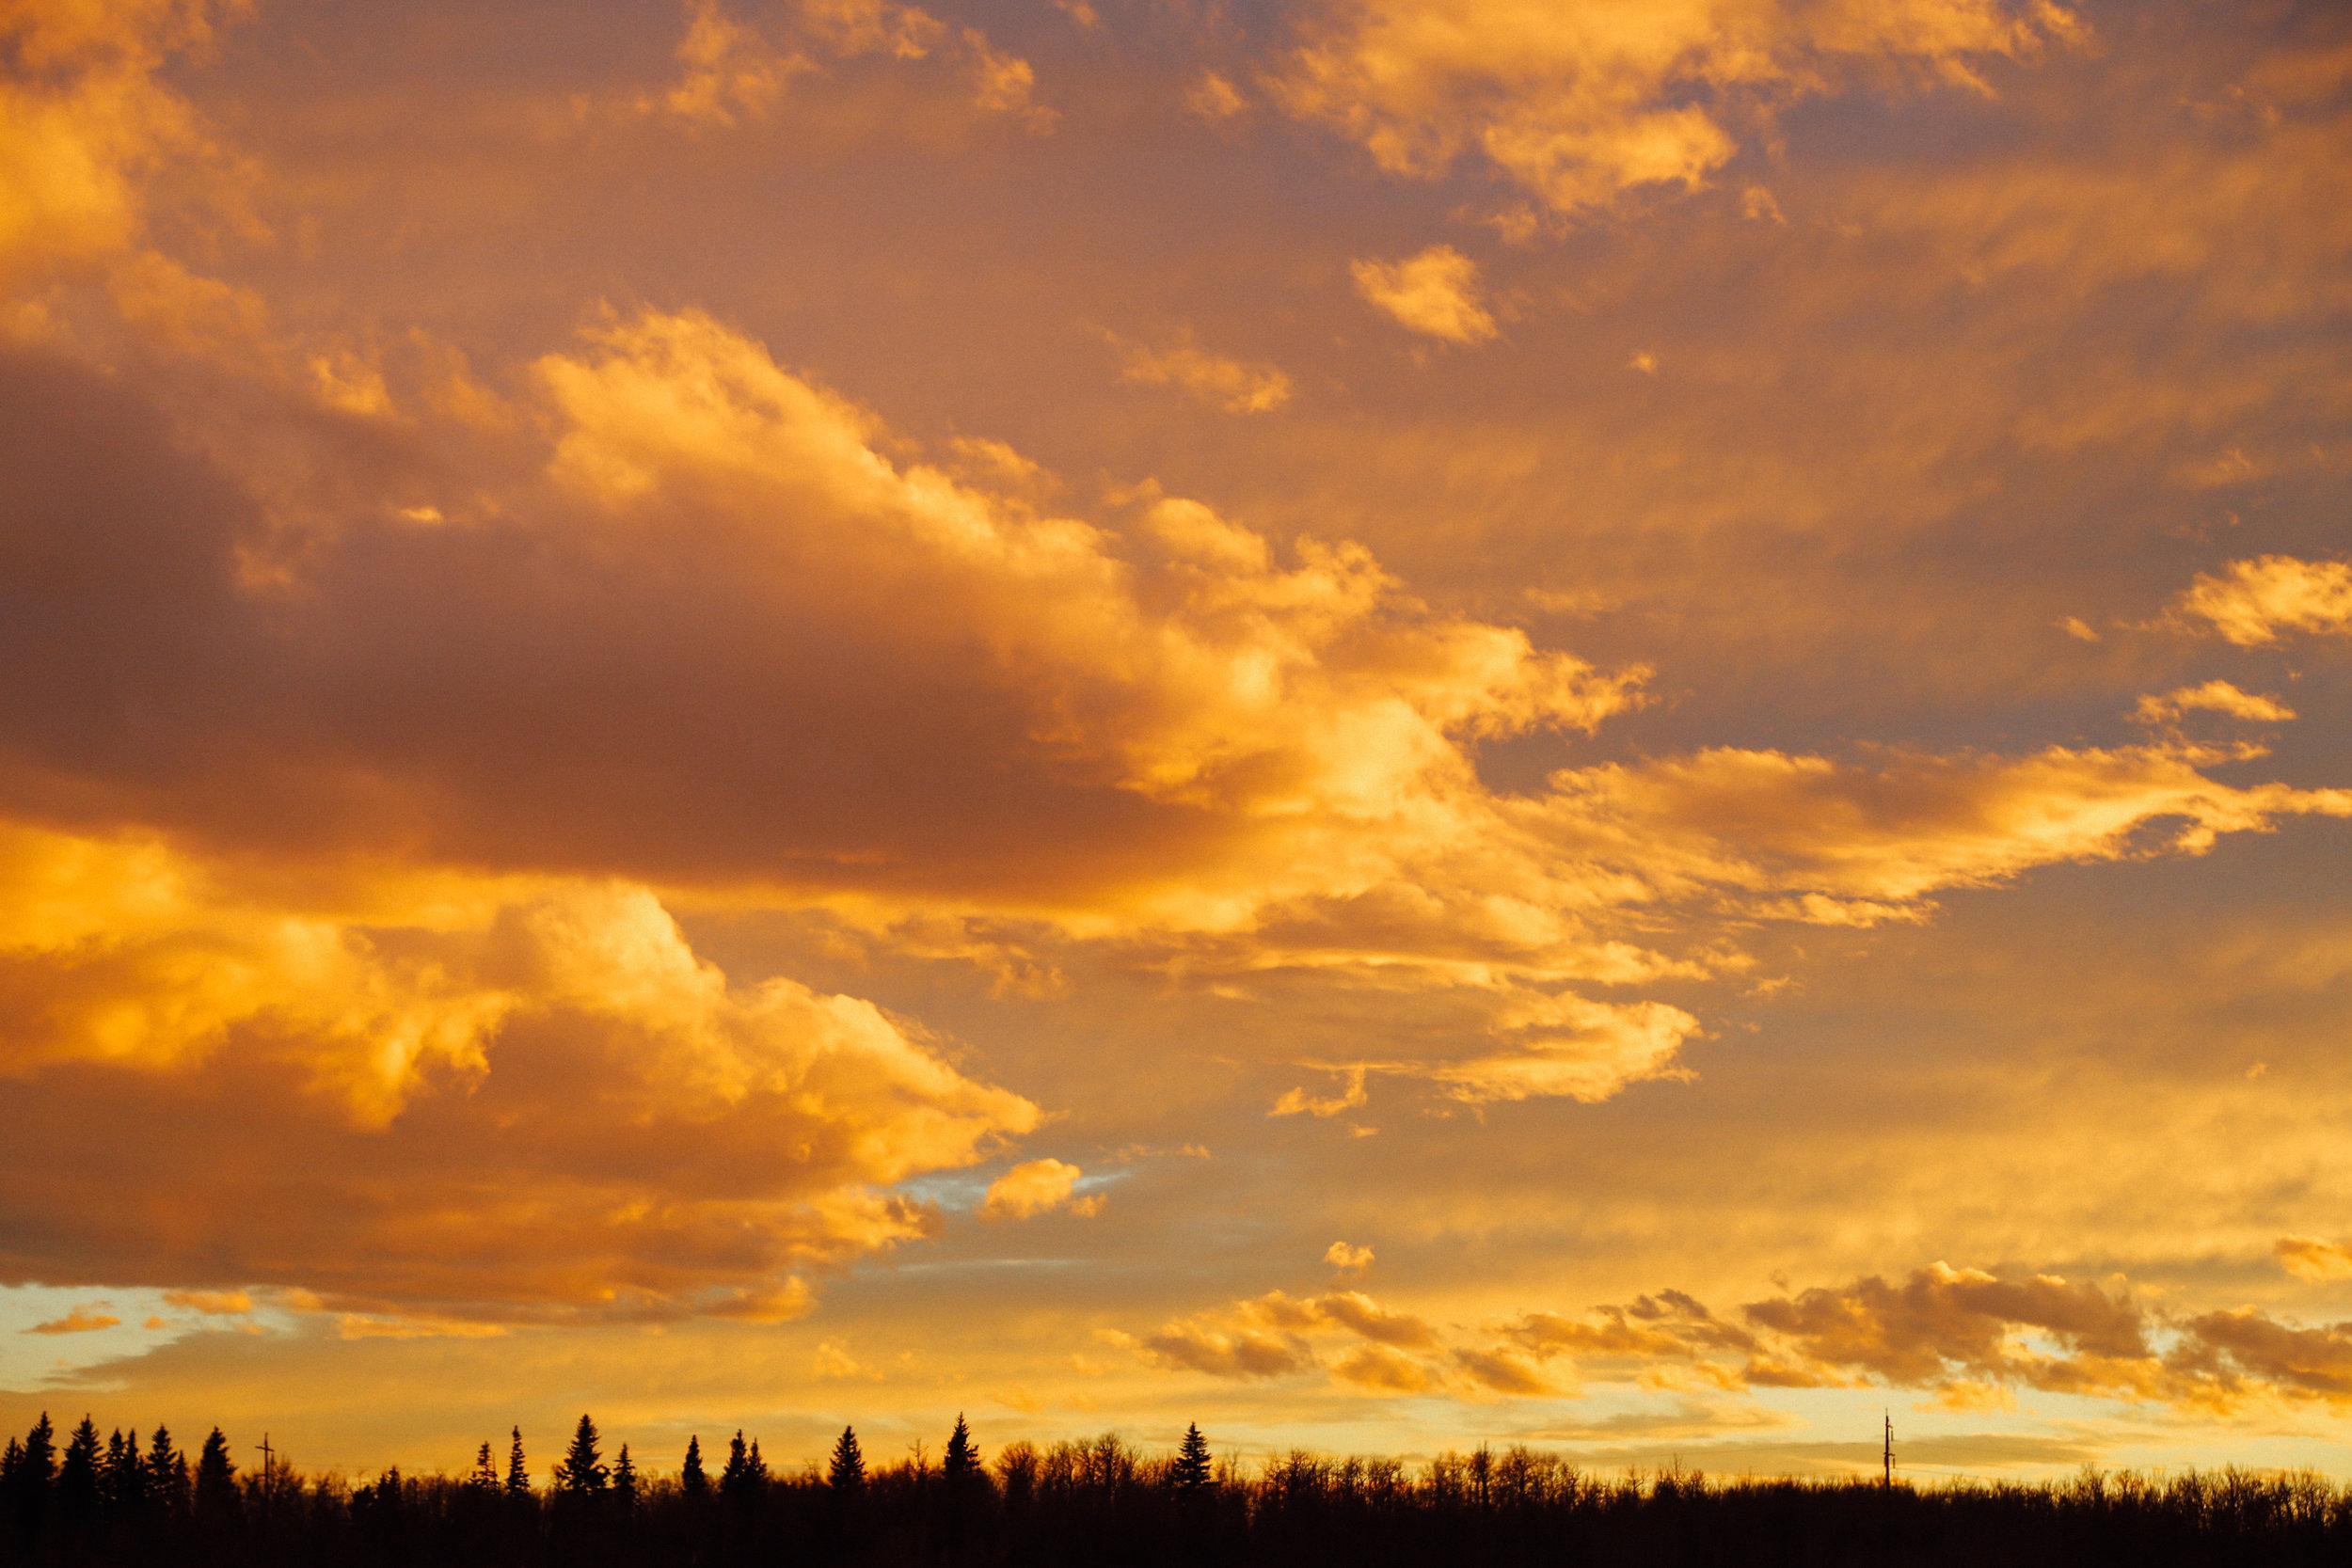 Farentosh Sky Feb 16 2017-6.jpg